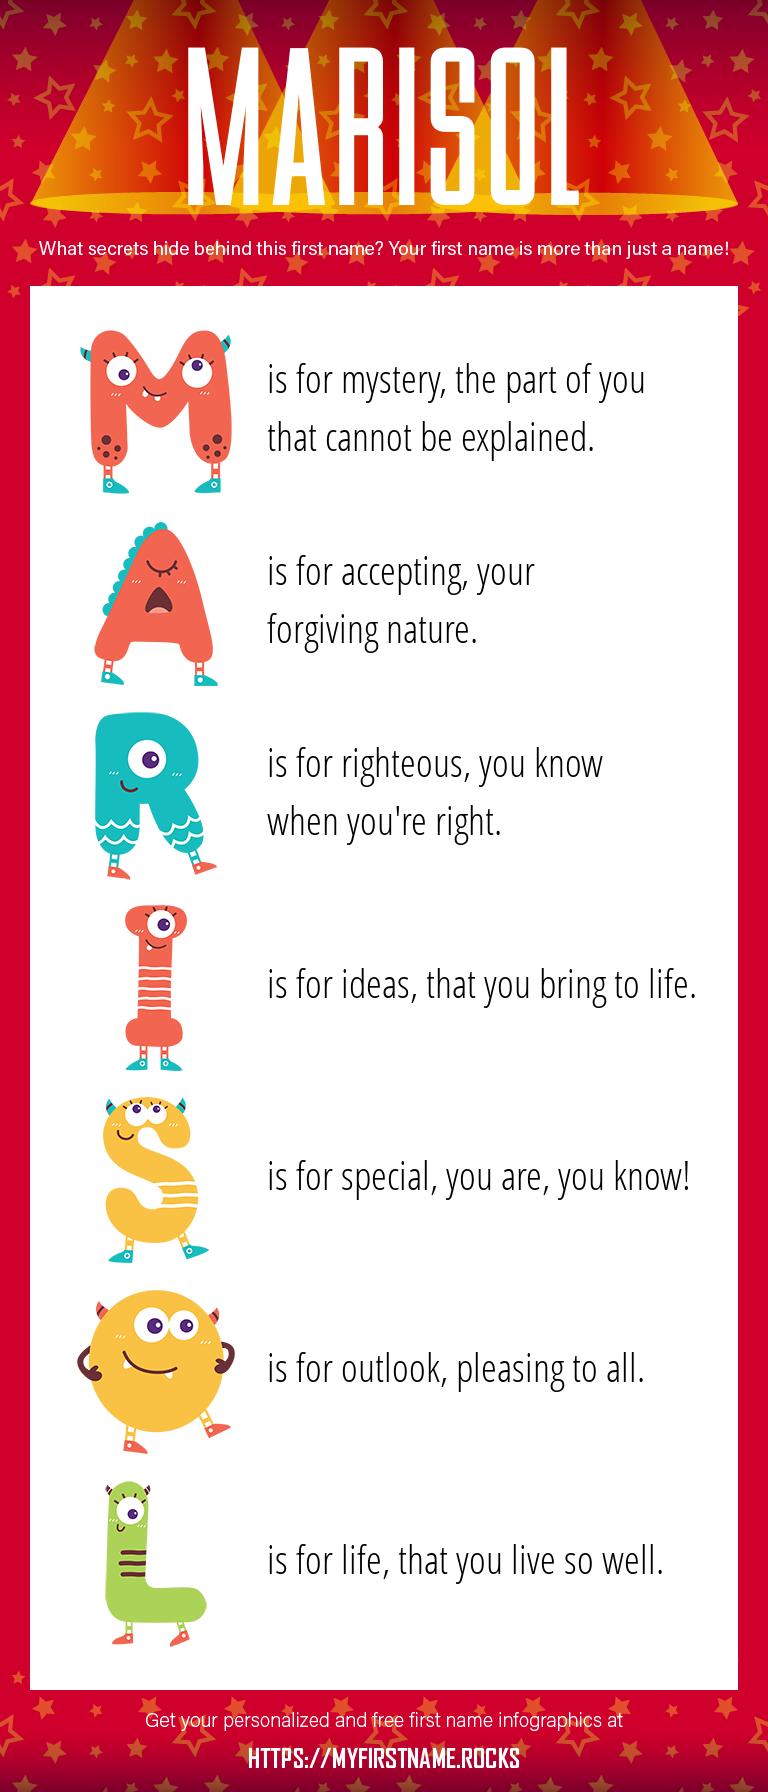 Marisol Infographics